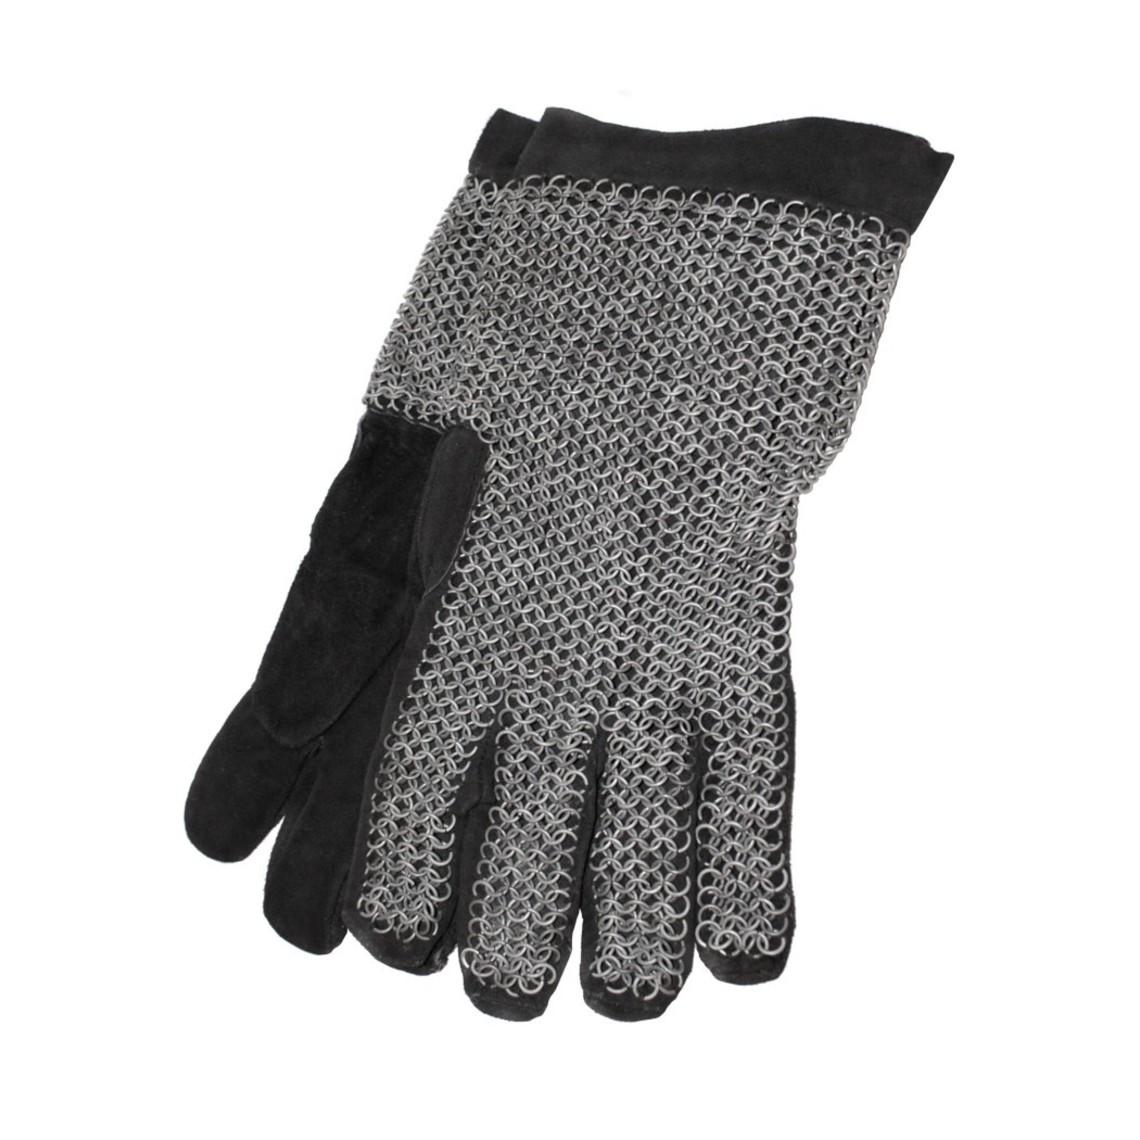 Glove-BIcycle Chainmaile